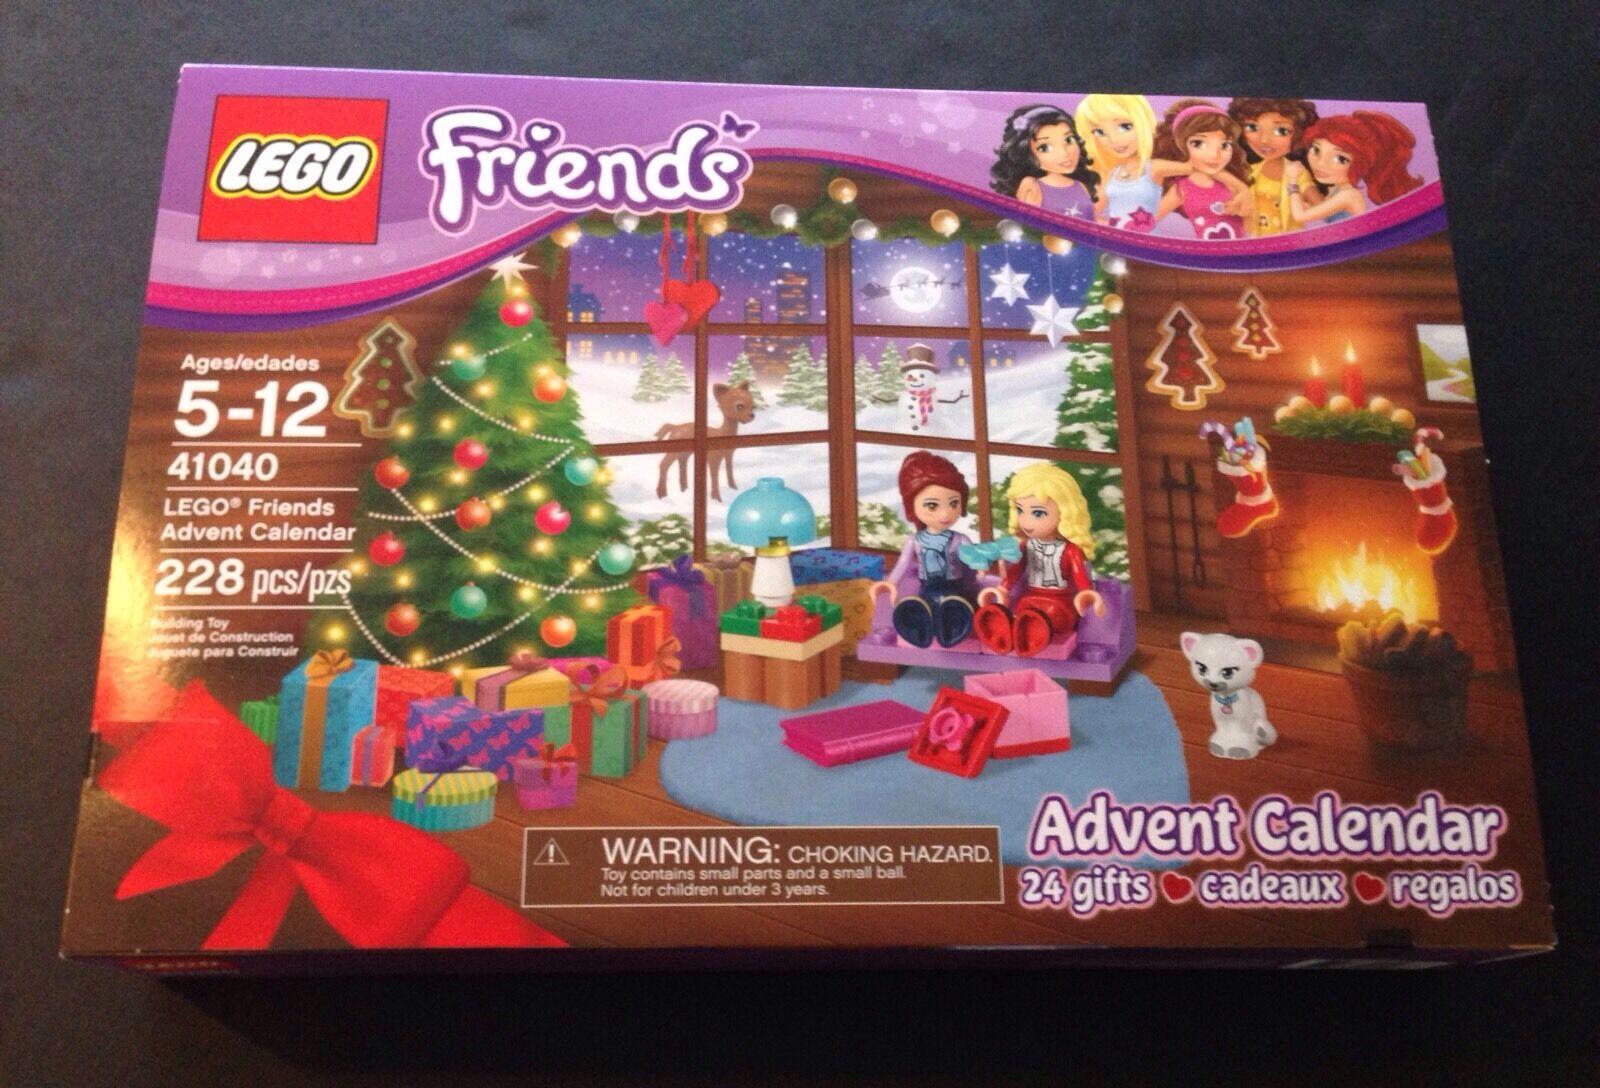 NISB New Sealed 2014 Lego Friends Advent Calendar 41040